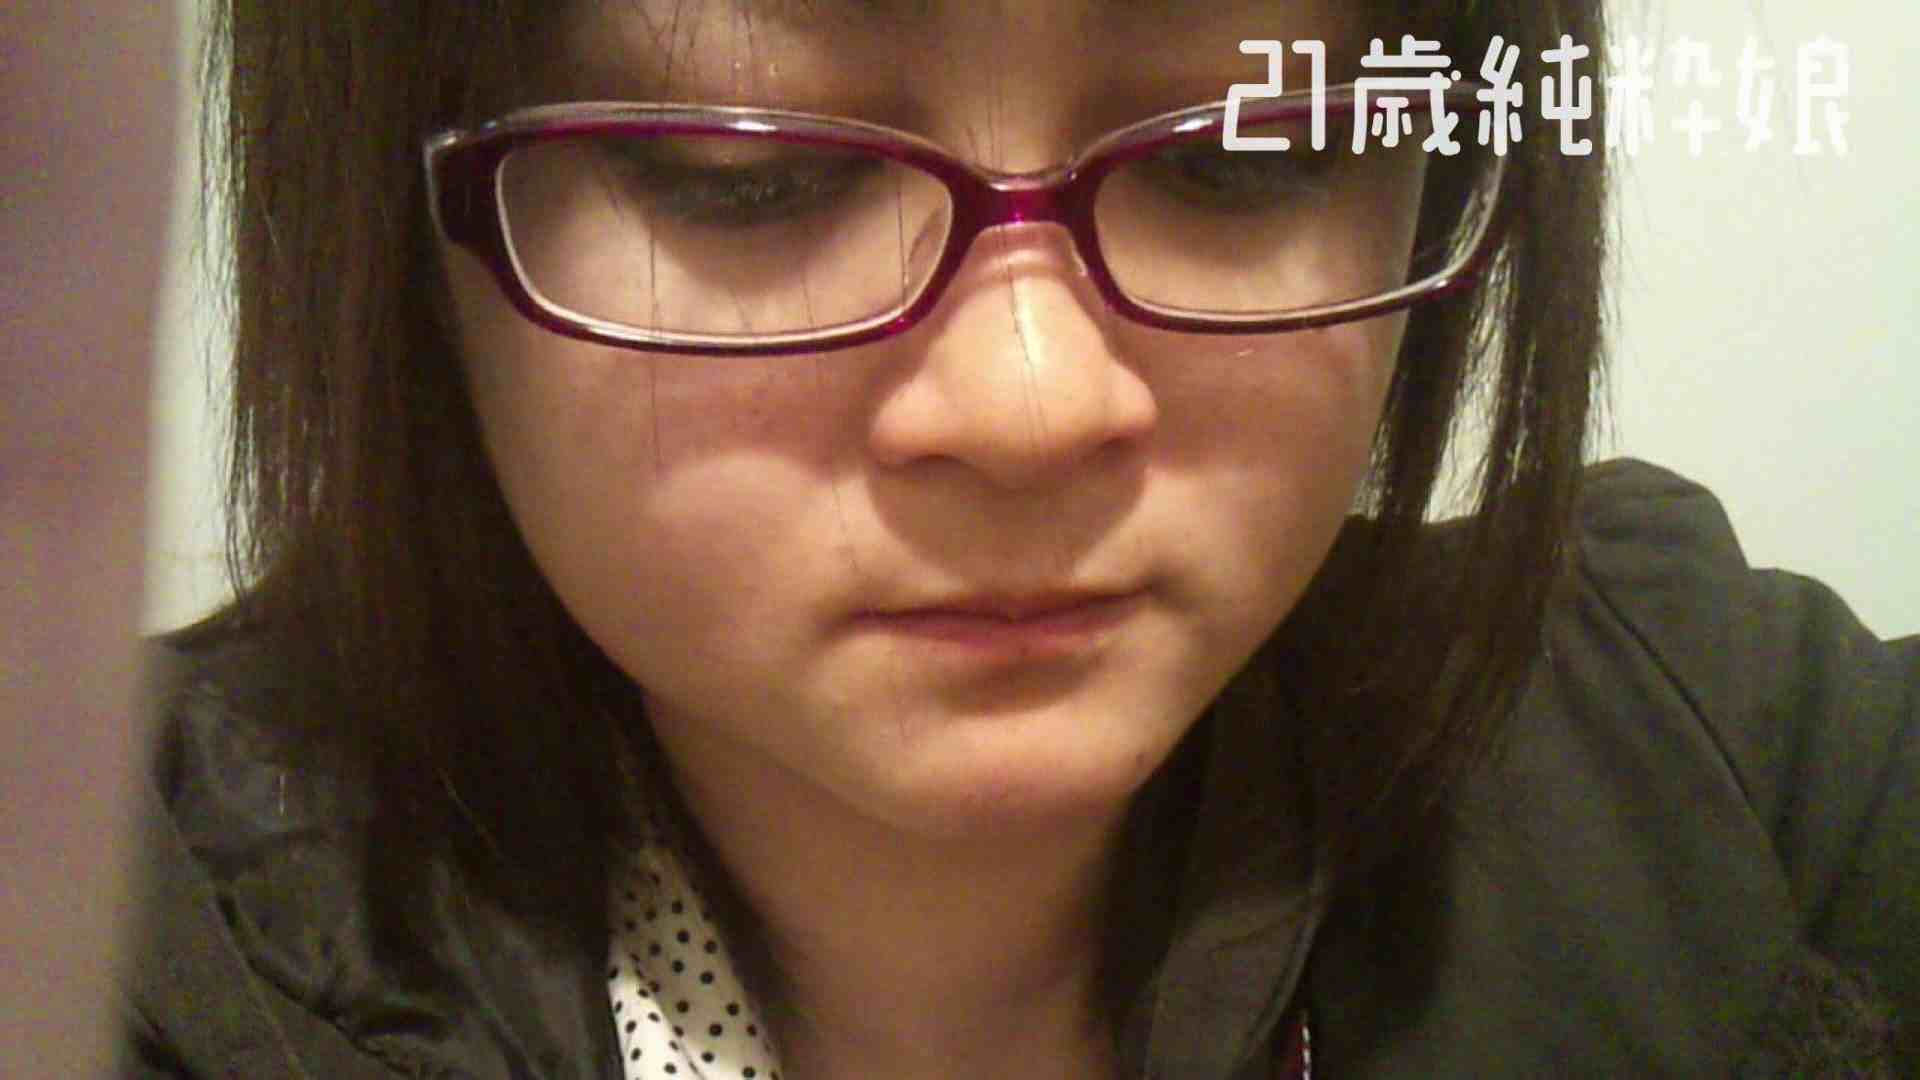 Gカップ21歳純粋嬢第2弾Vol.5 OLヌード天国  110PIX 94